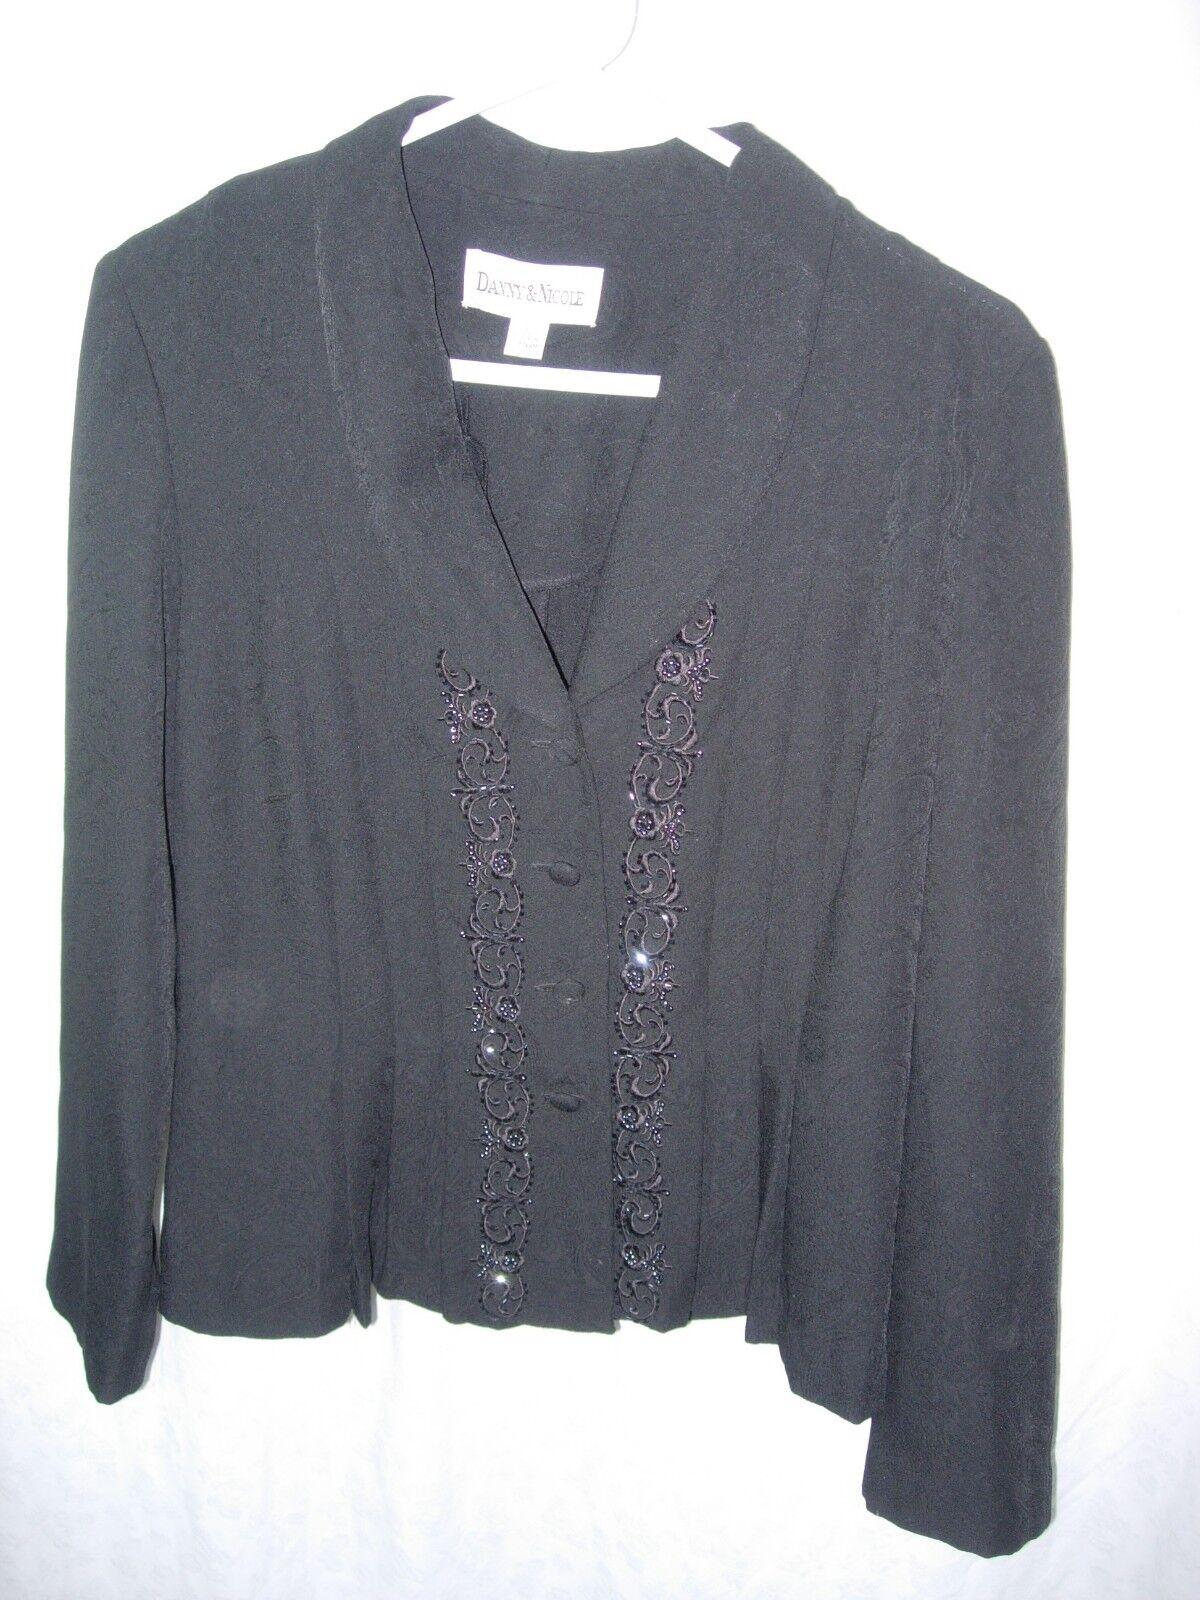 WOMENS BLACK BEADED MOTHER OF THE BRIDE SUIT COAT BLAZER DRESS JACKET SIZE 12 42